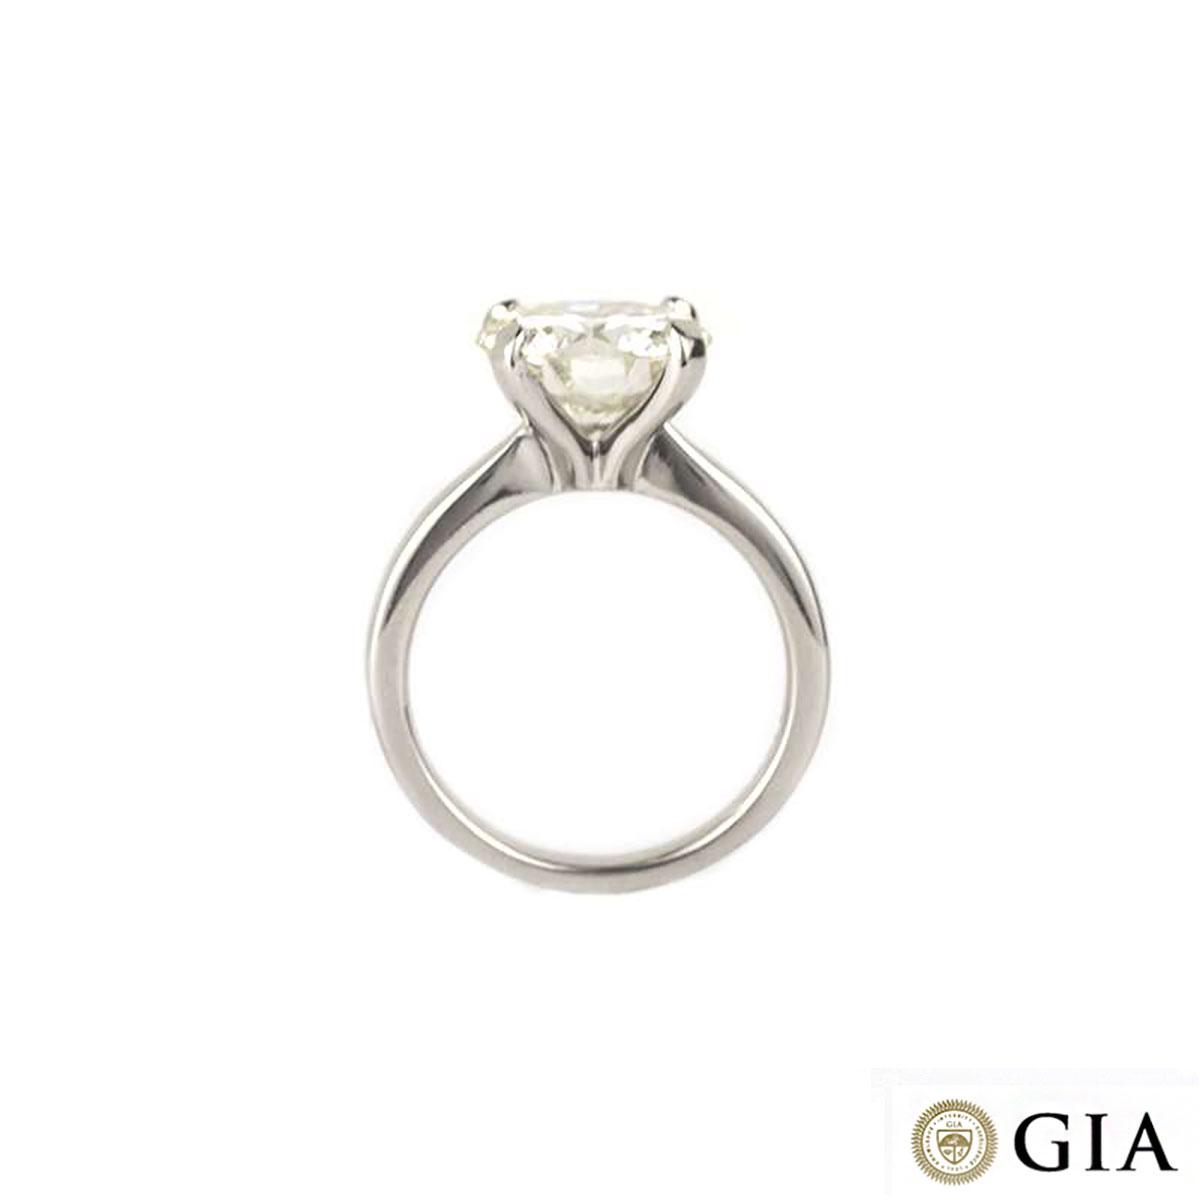 Platinum Diamond Ring 4.13ct L/VVS2